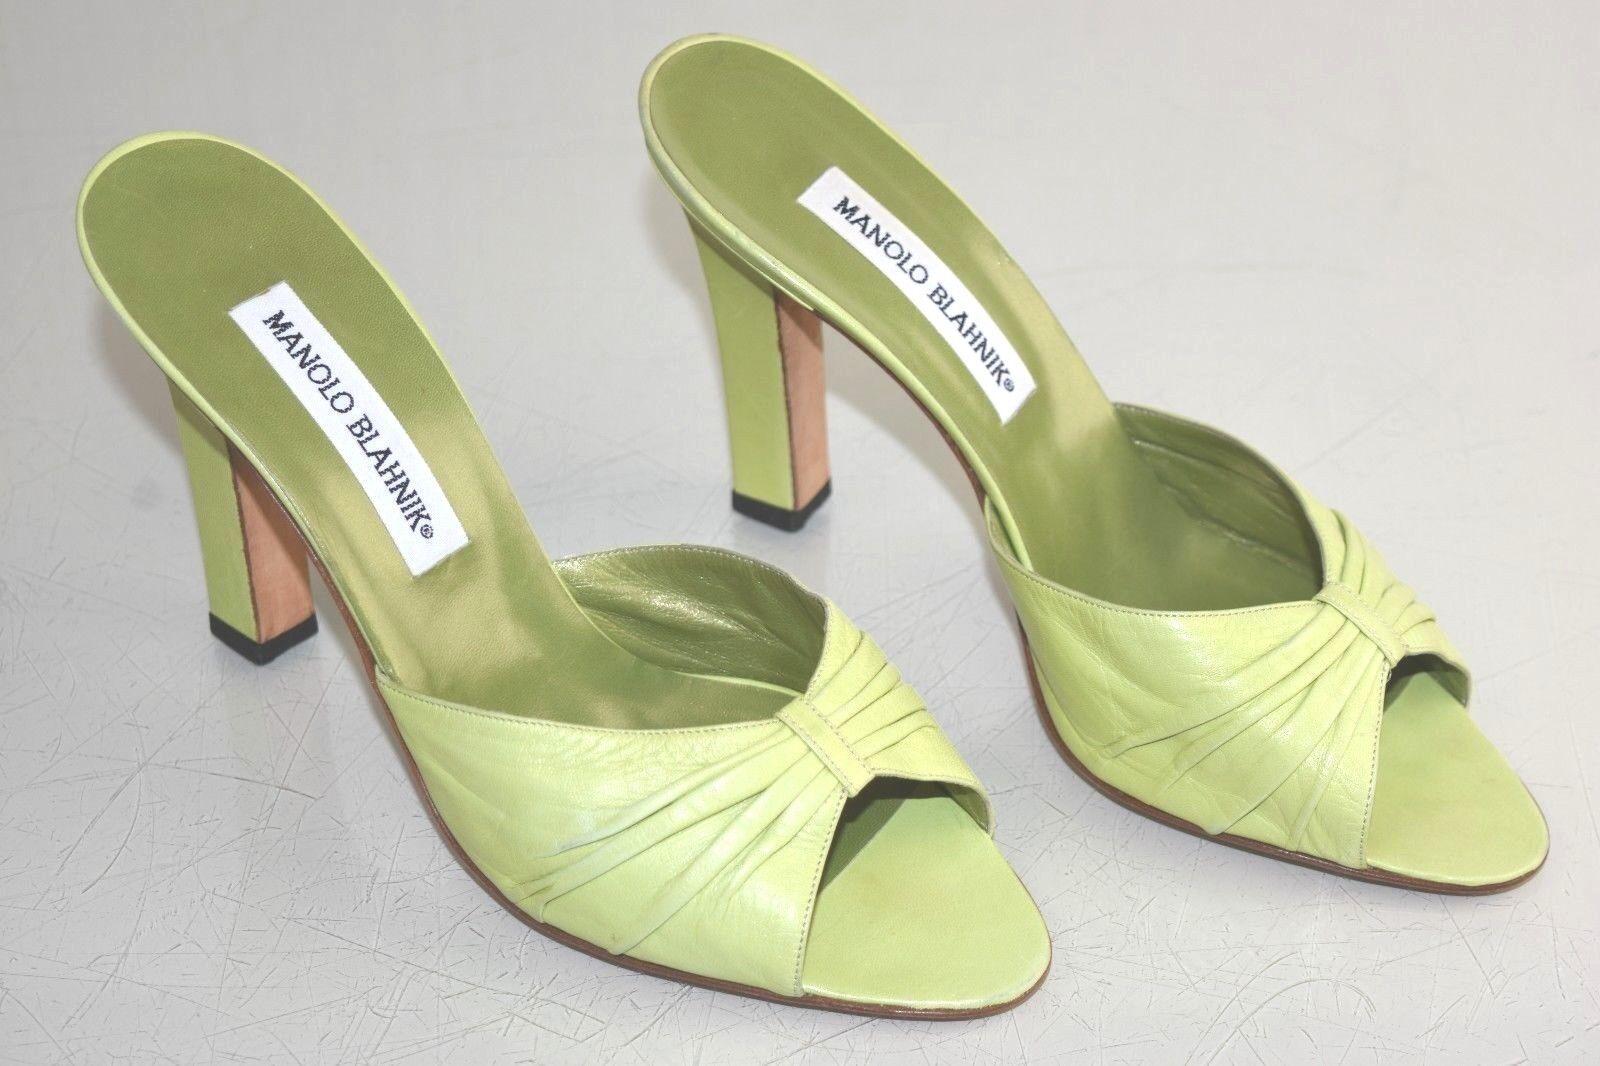 NEW Manolo Blahkin Slides Sandals Leather Grün Lime Mules Heels schuhe 39.5 RARE